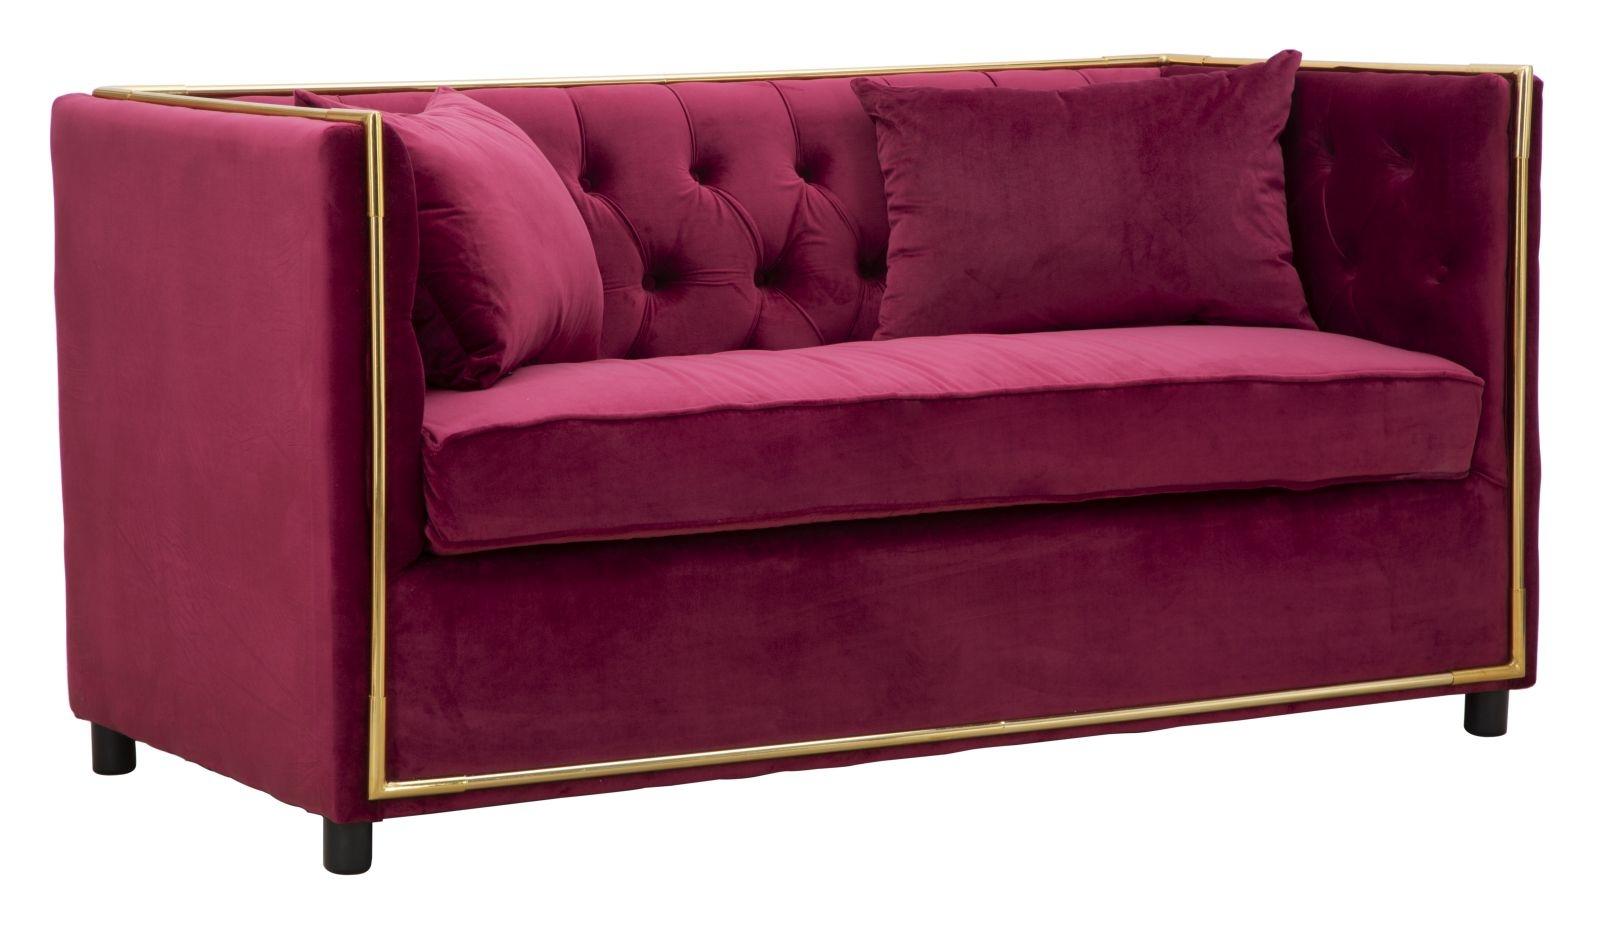 Canapea fixa tapitata cu stofa 2 locuri Luxury Bordeaux l153xA78xH79 cm